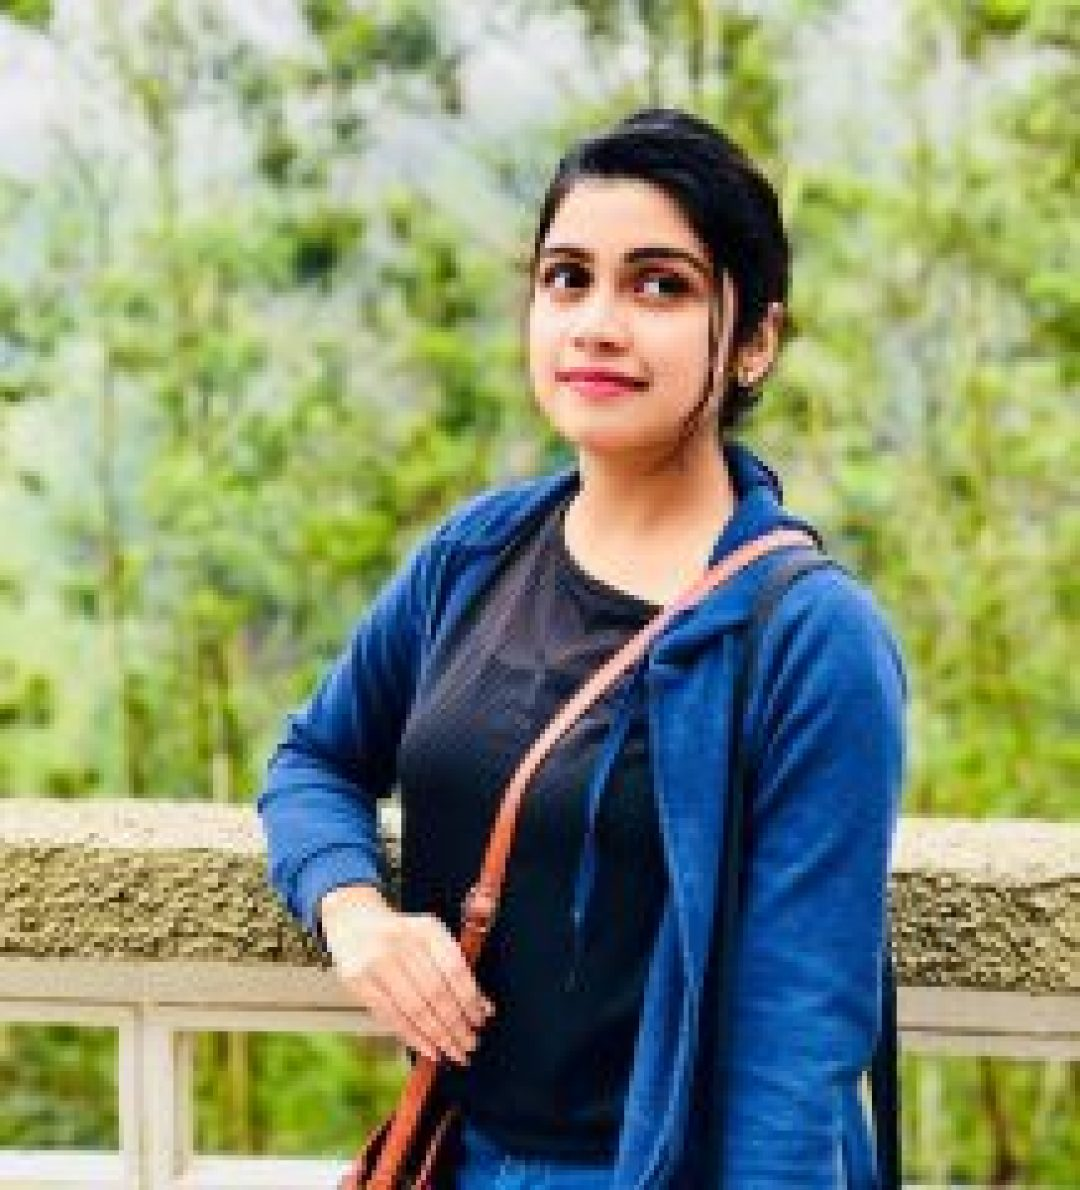 New Look of Manasa Radhakrishnan